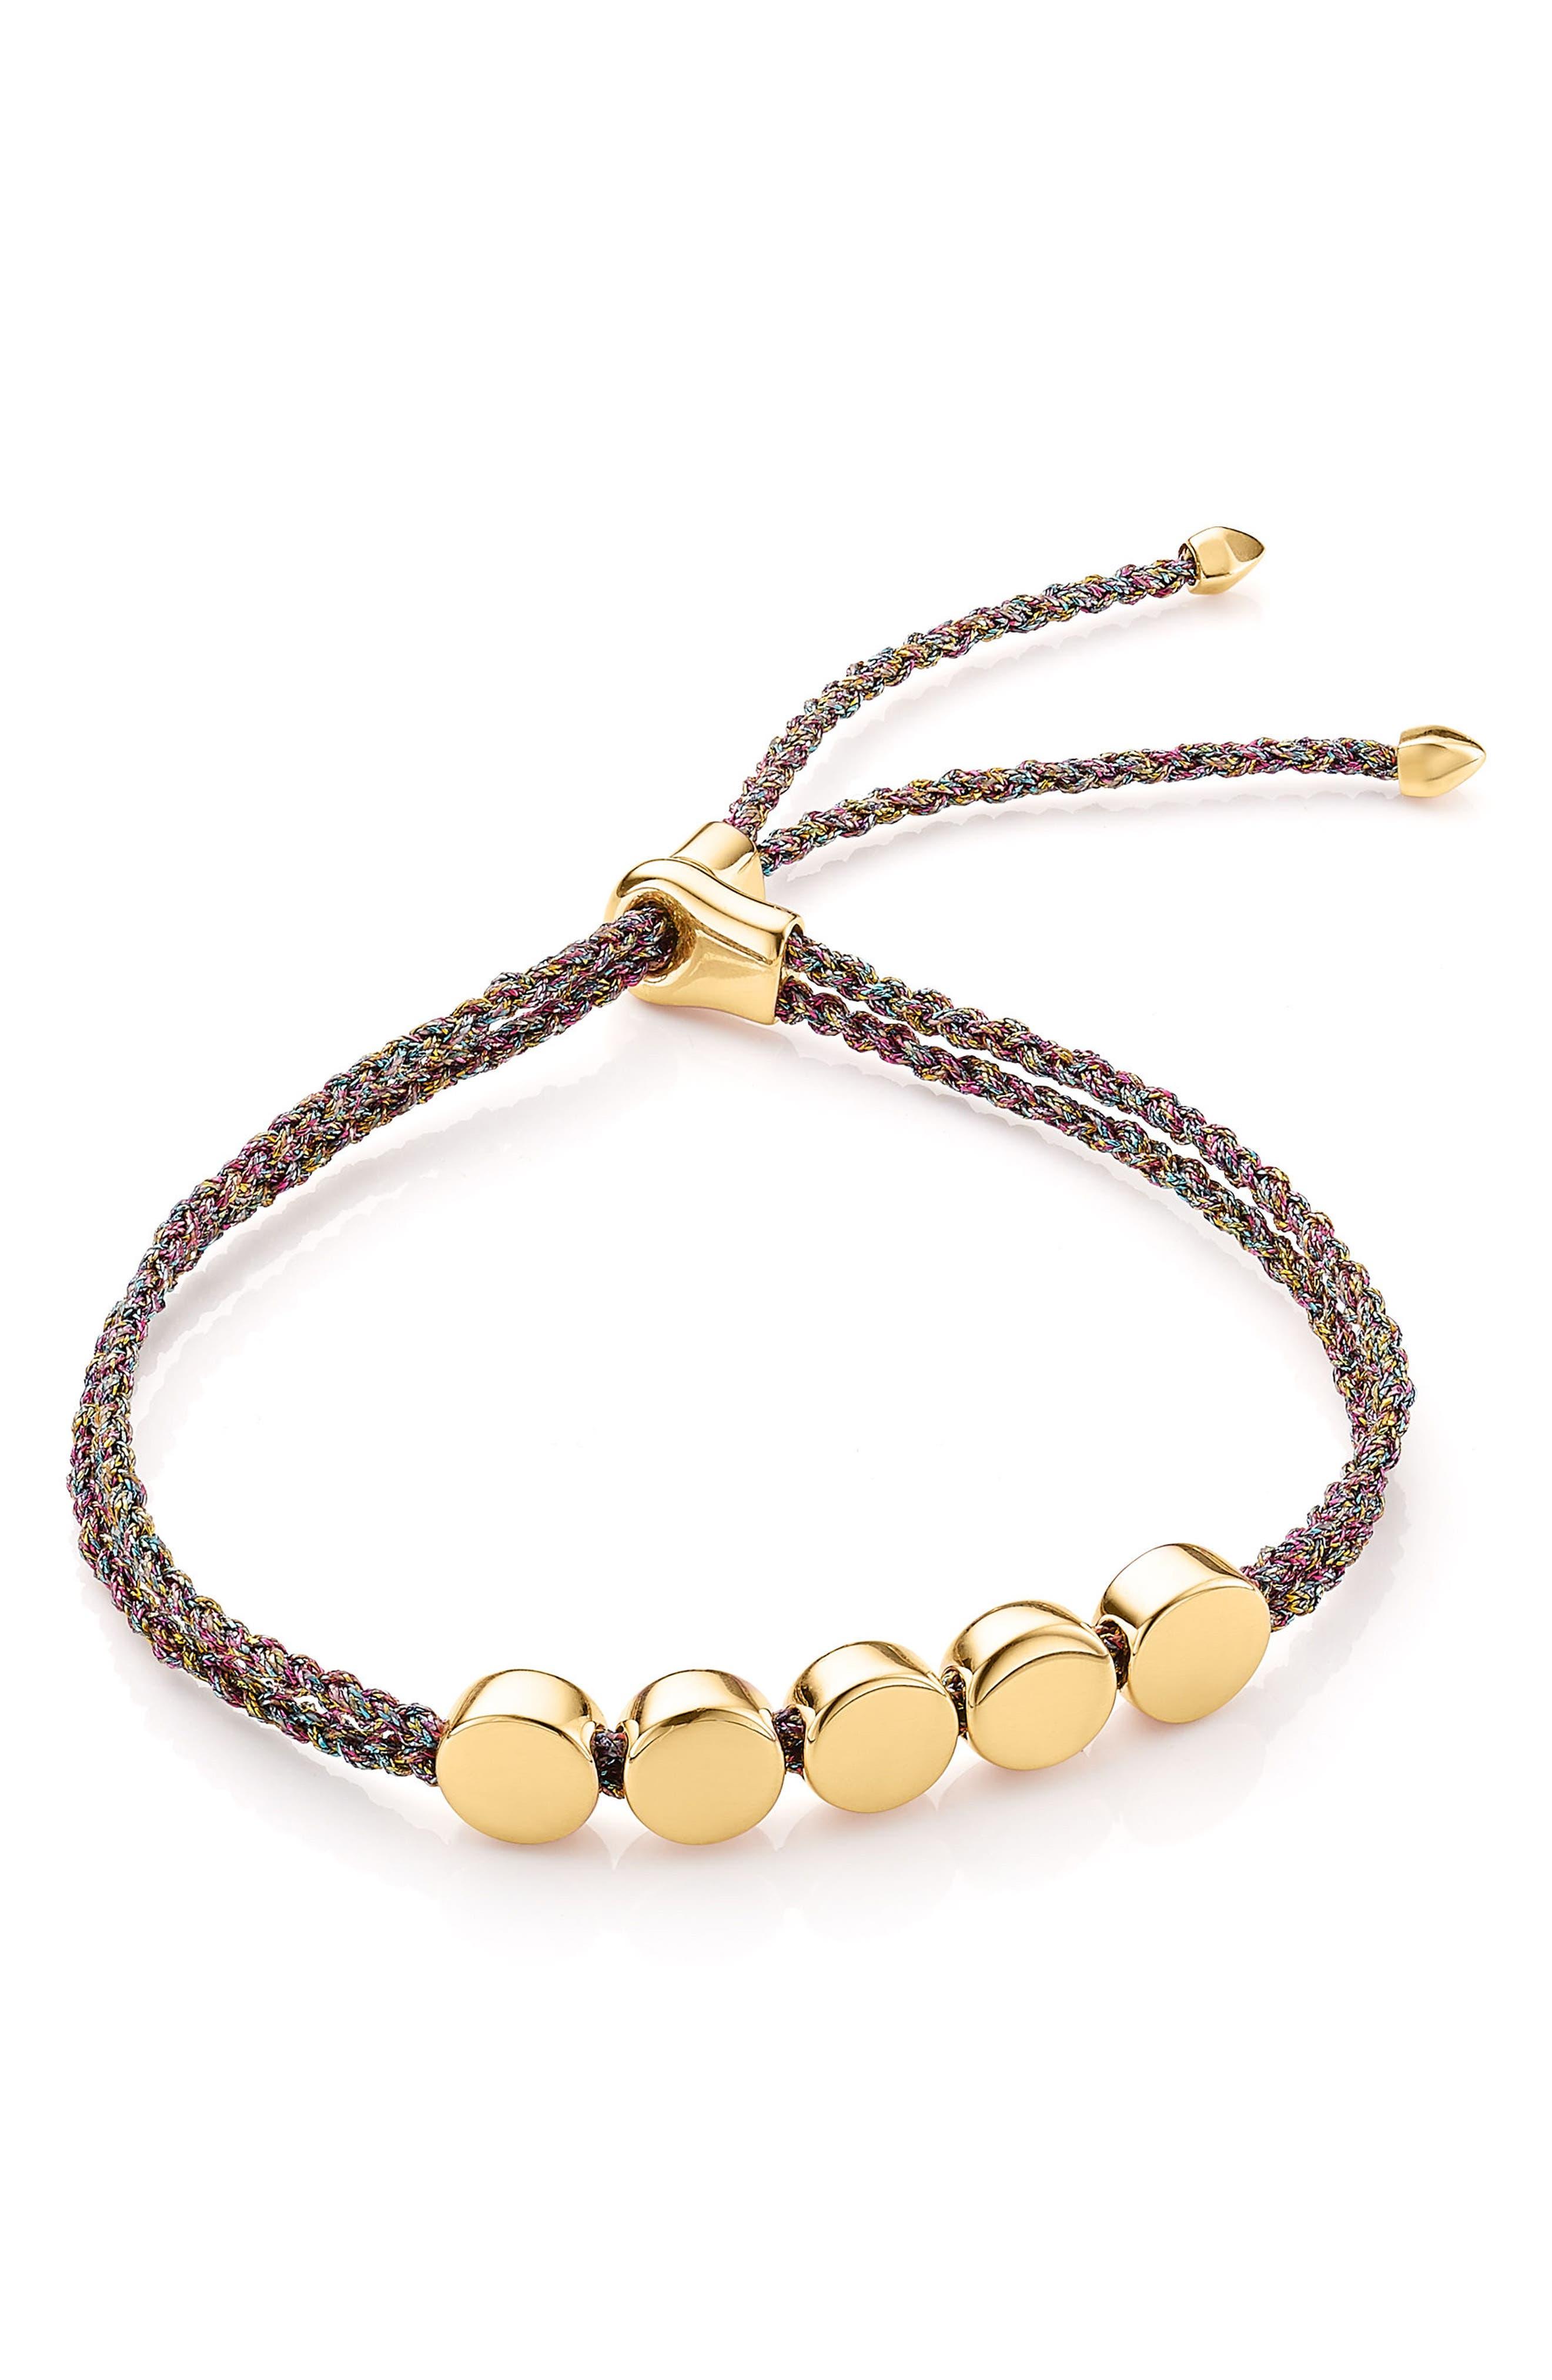 Alternate Image 1 Selected - Monica Vinader Linear Bead Friendship Bracelet